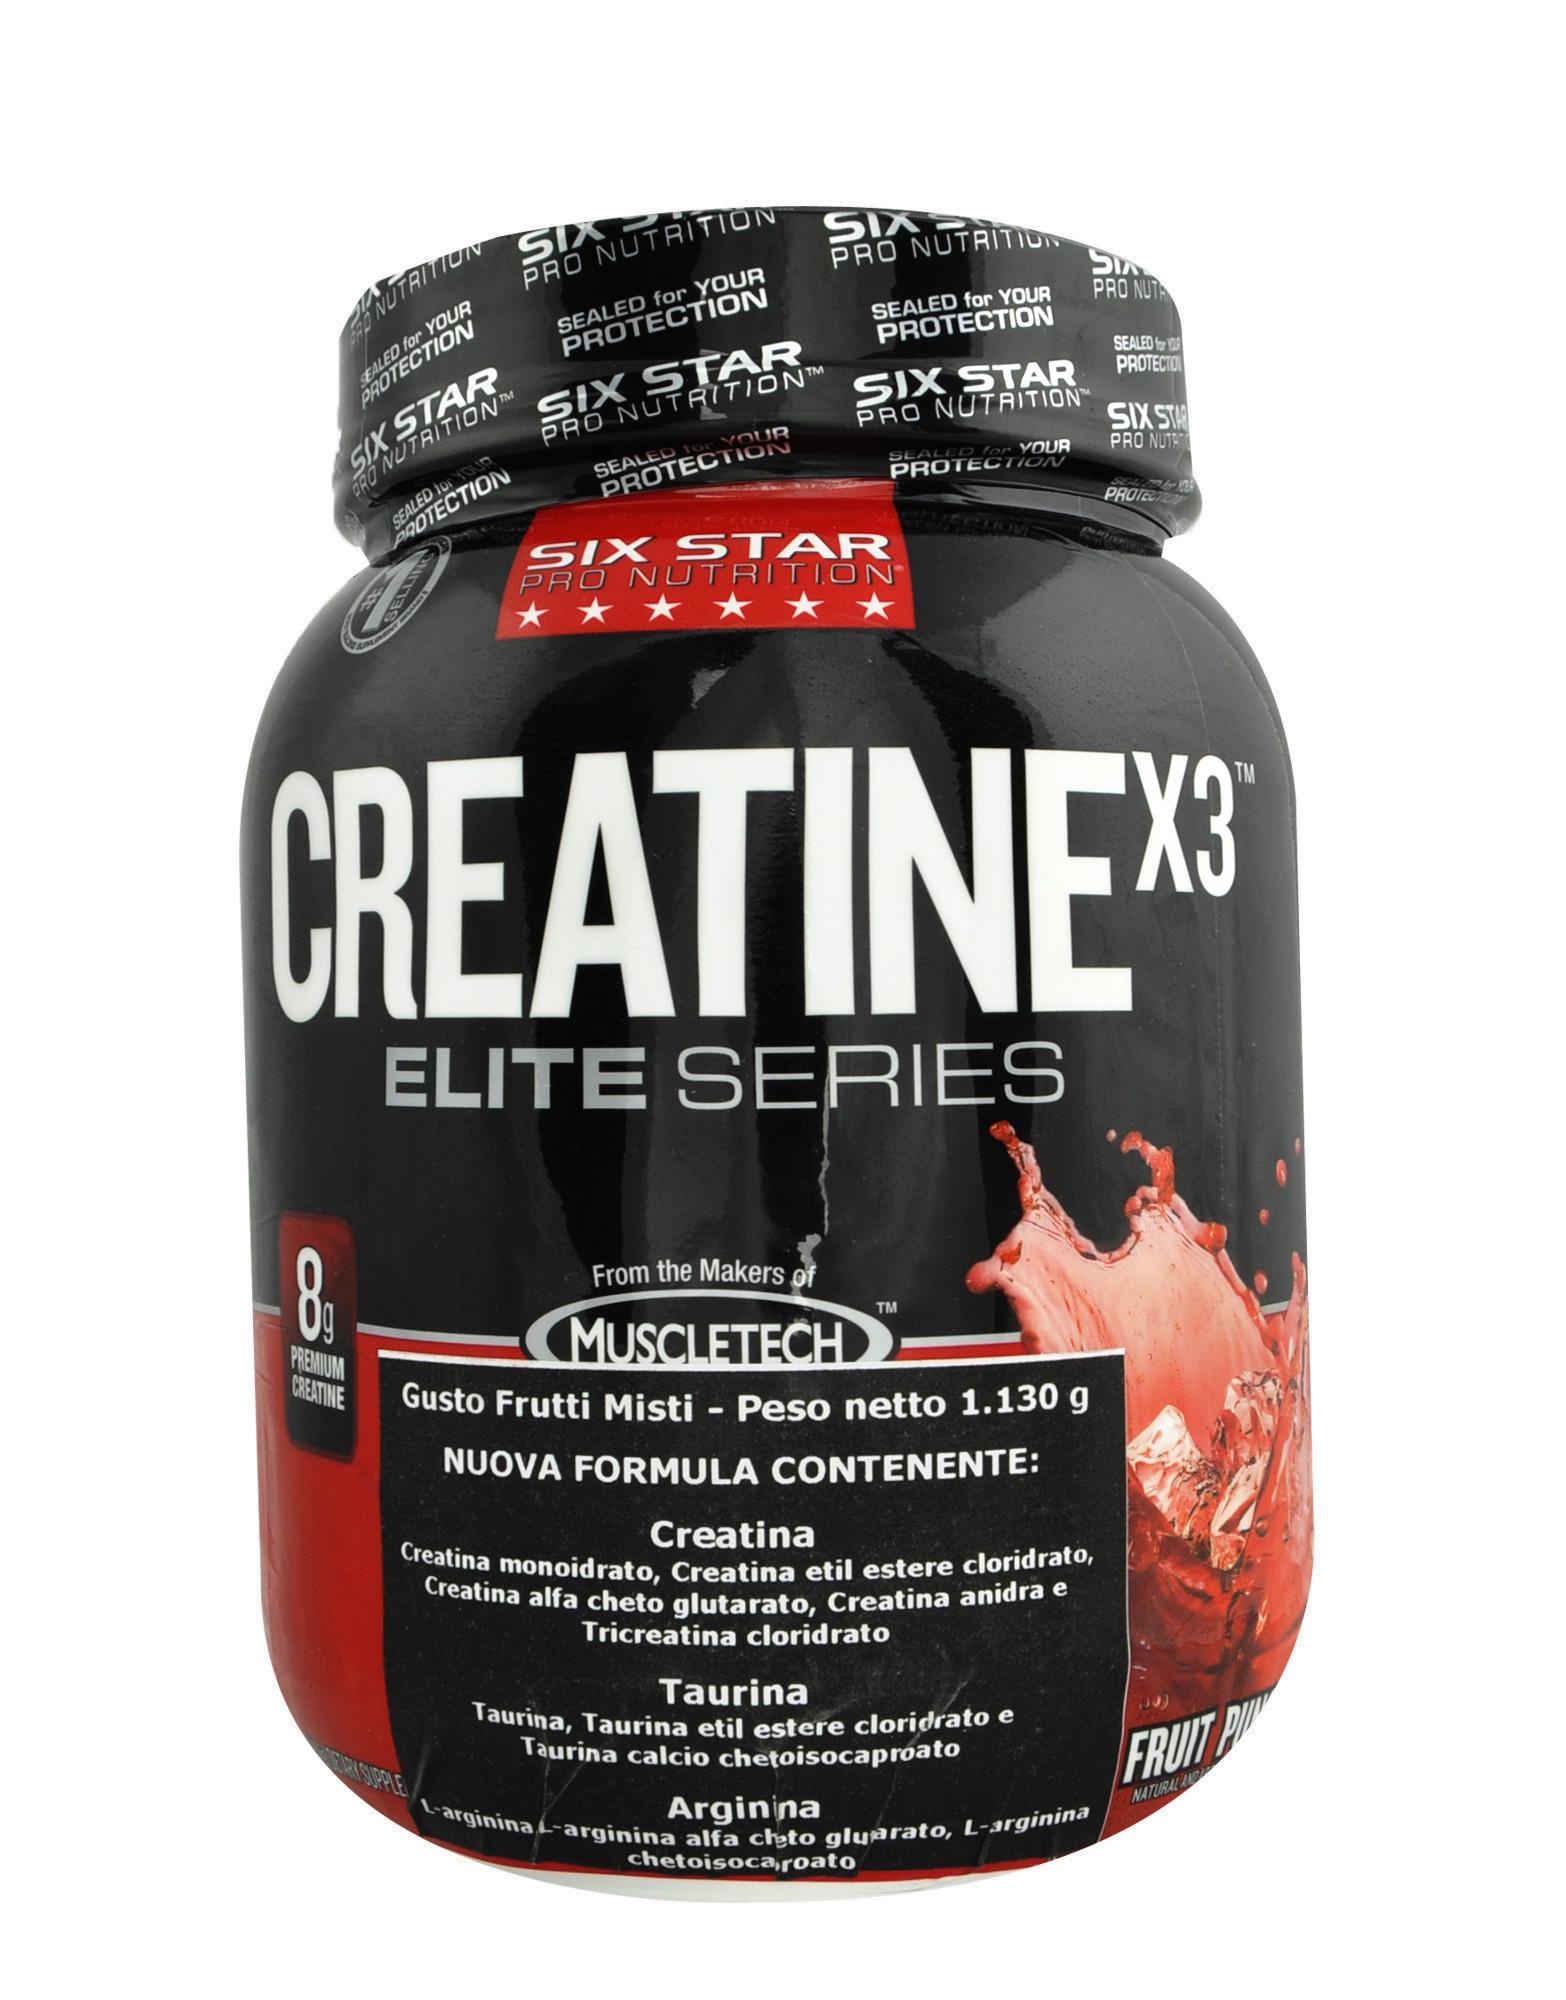 Creatine X3 by Six star pro nutrition